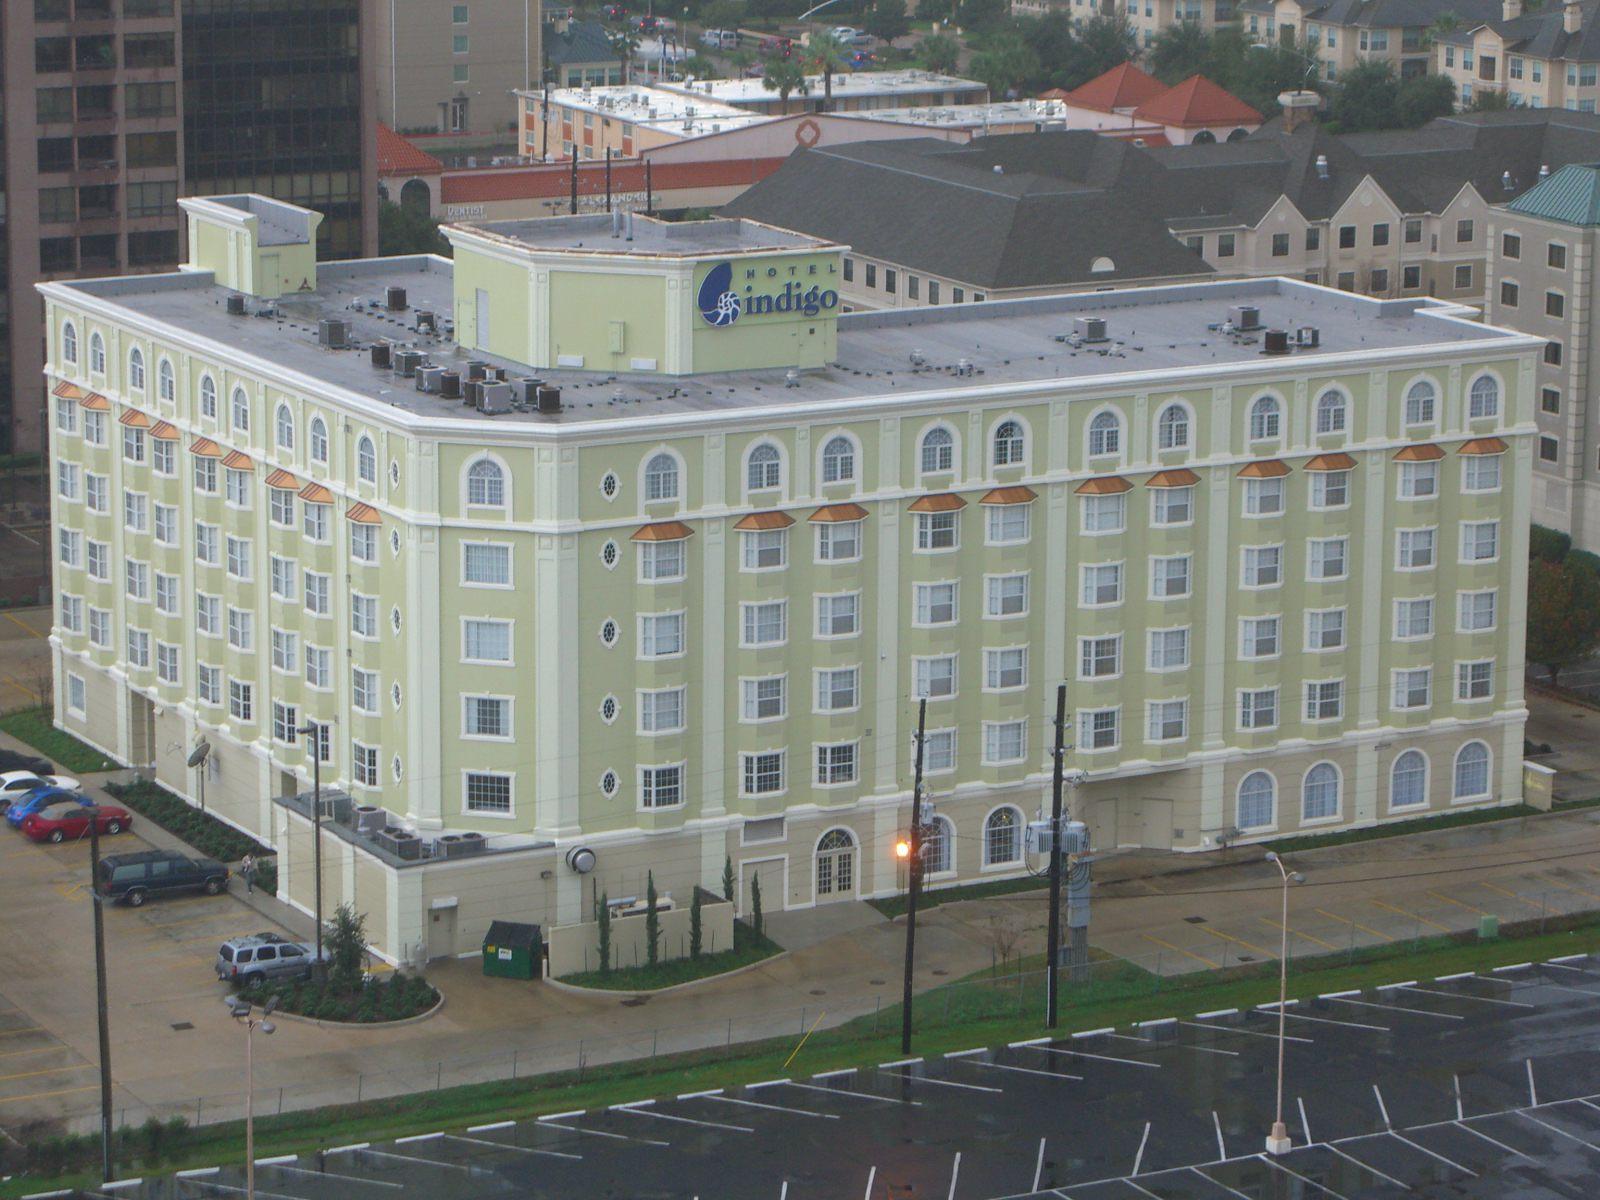 Hotel Indigo Wikipedia